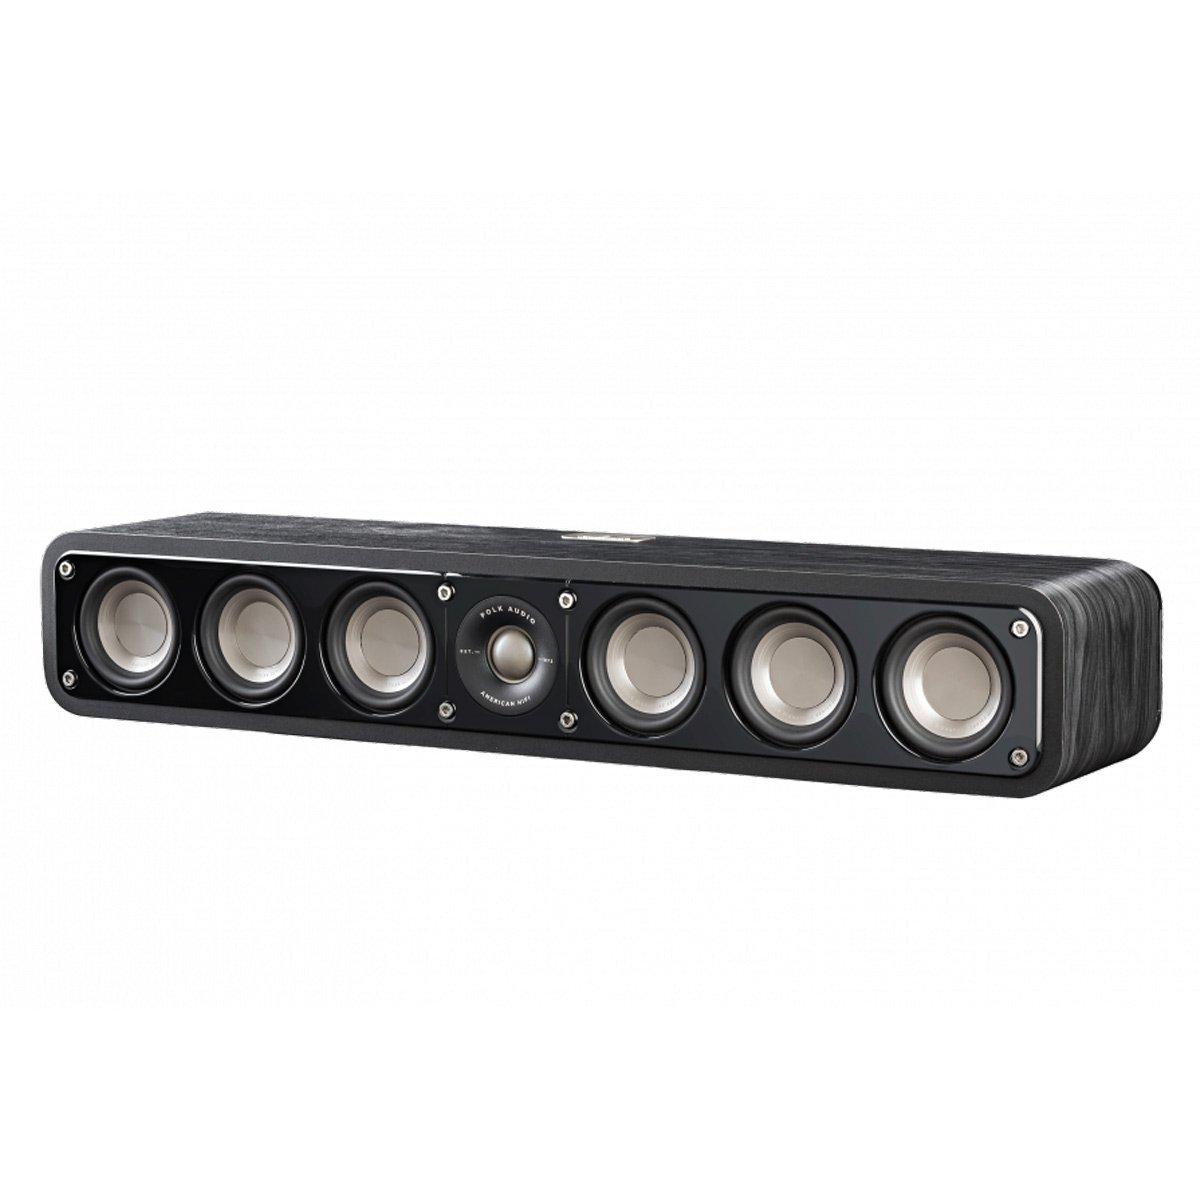 Polk Audio Signature Series S35 American Hi-Fi Home Theater Slim Center Speaker (Classic Brown Walnut)